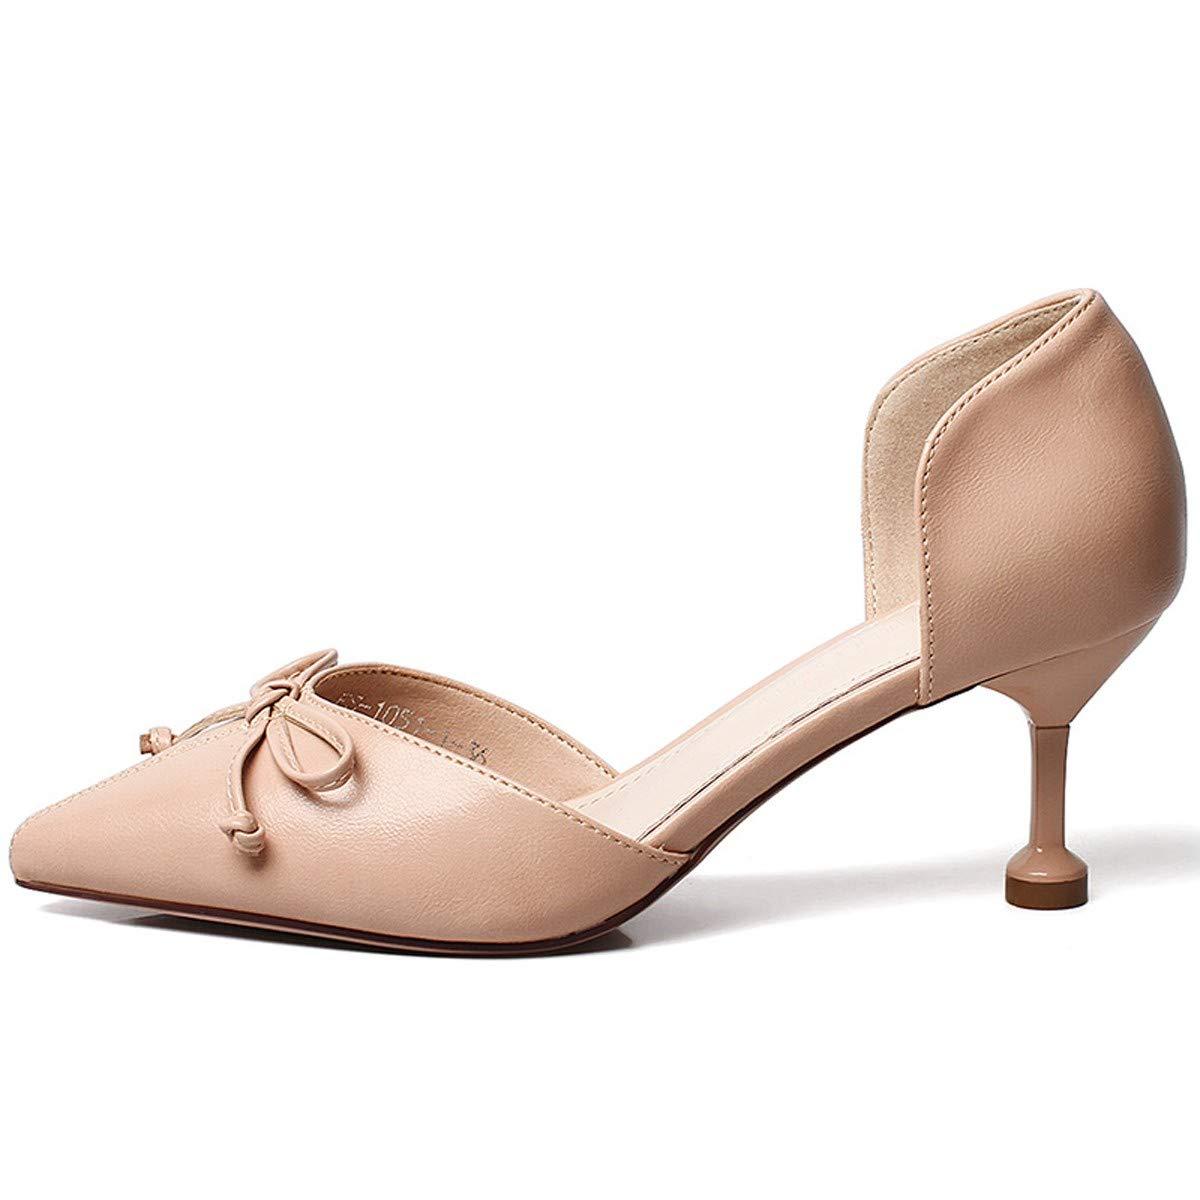 LBTSQ-High Heels 6cm Joker Bogen Sexy Zeigte Mitte der Ferse Mode Schuhe.